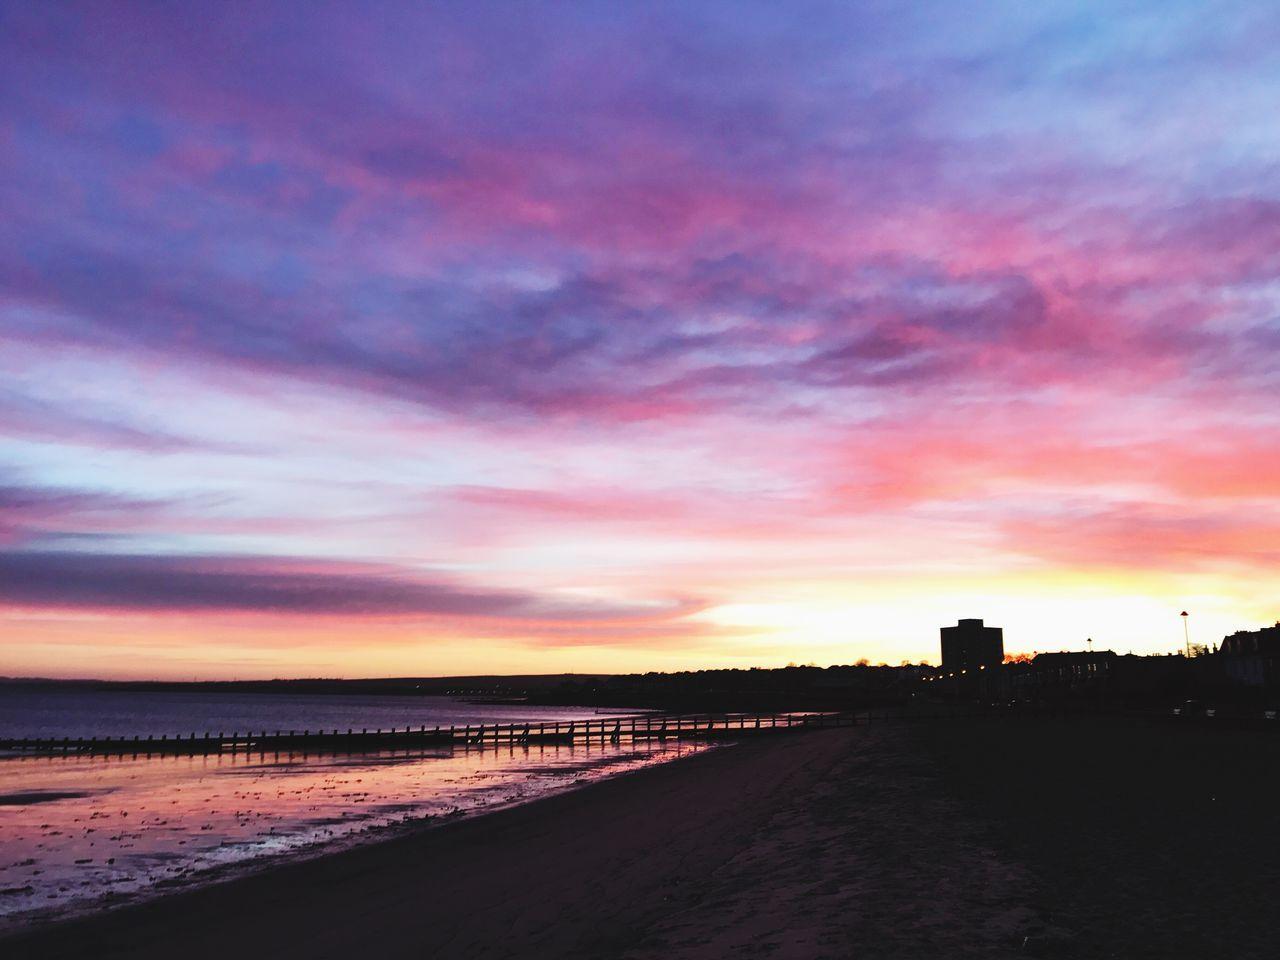 Sunset #sun #clouds #skylovers #sky #nature #beautifulinnature #naturalbeauty #photography #landscape EyeEm Best Shots Beachphotography Portobello Beach, Edinburgh Sunrise_Collection